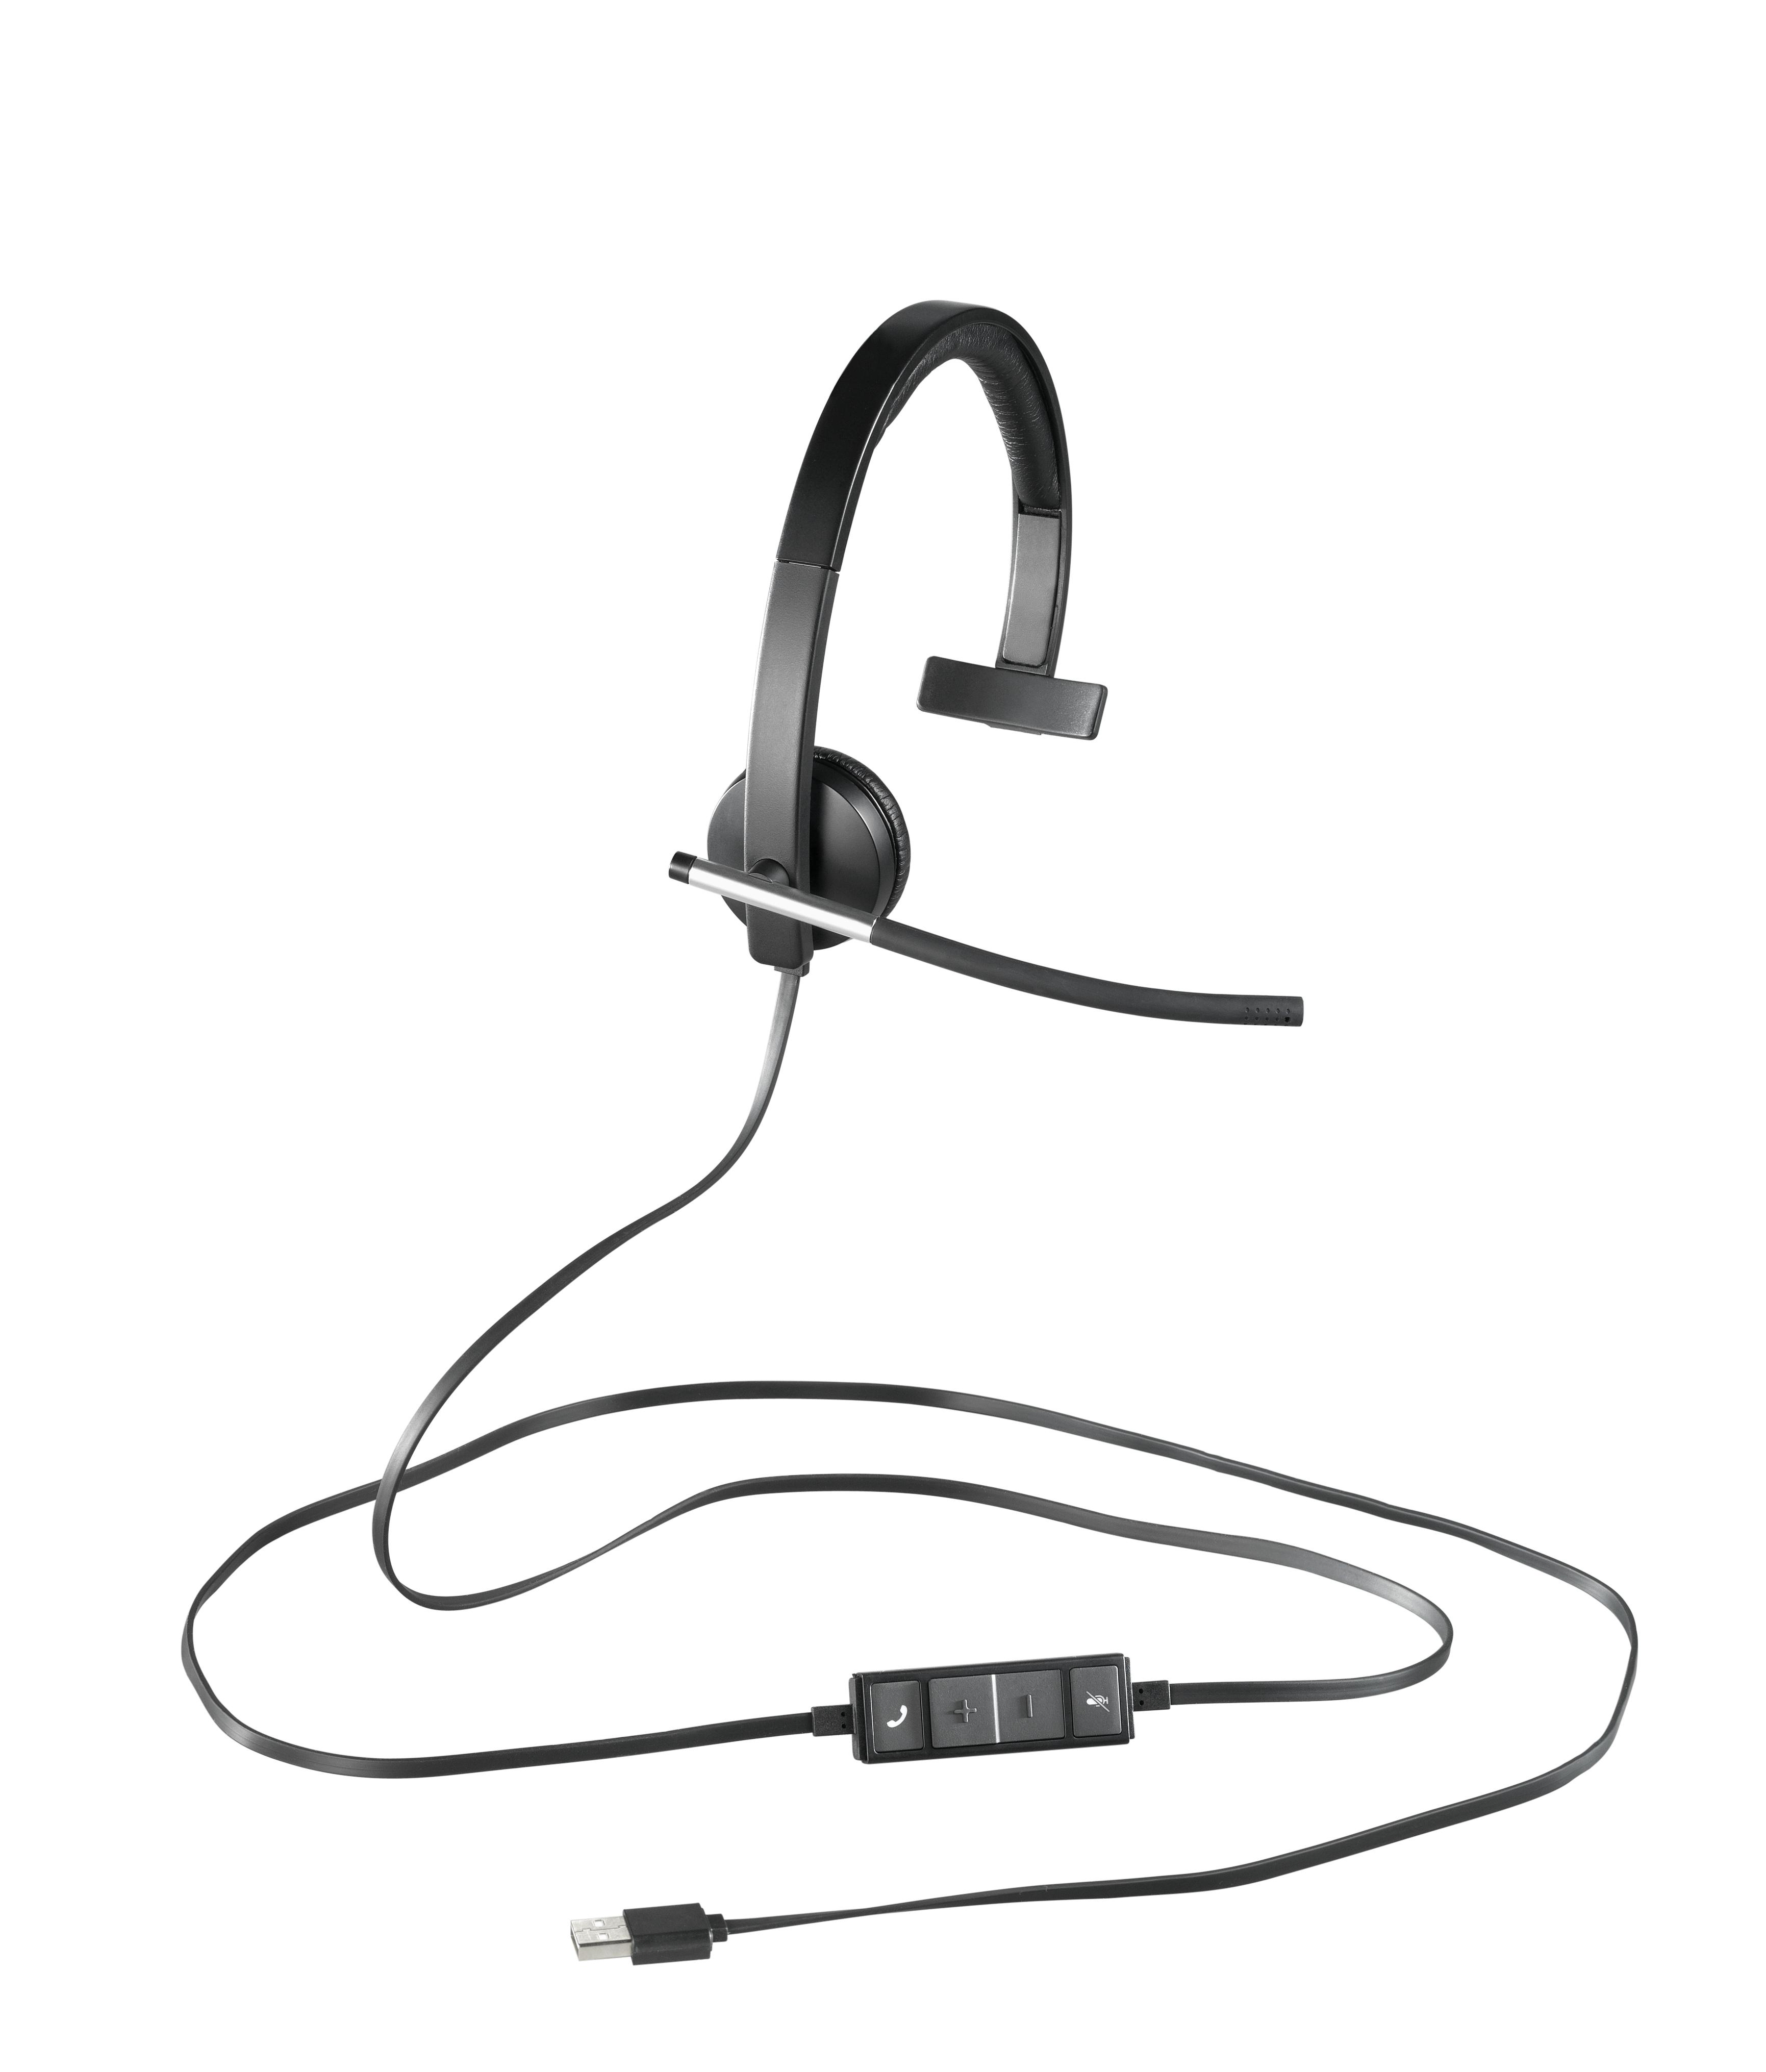 H650e USB Headset